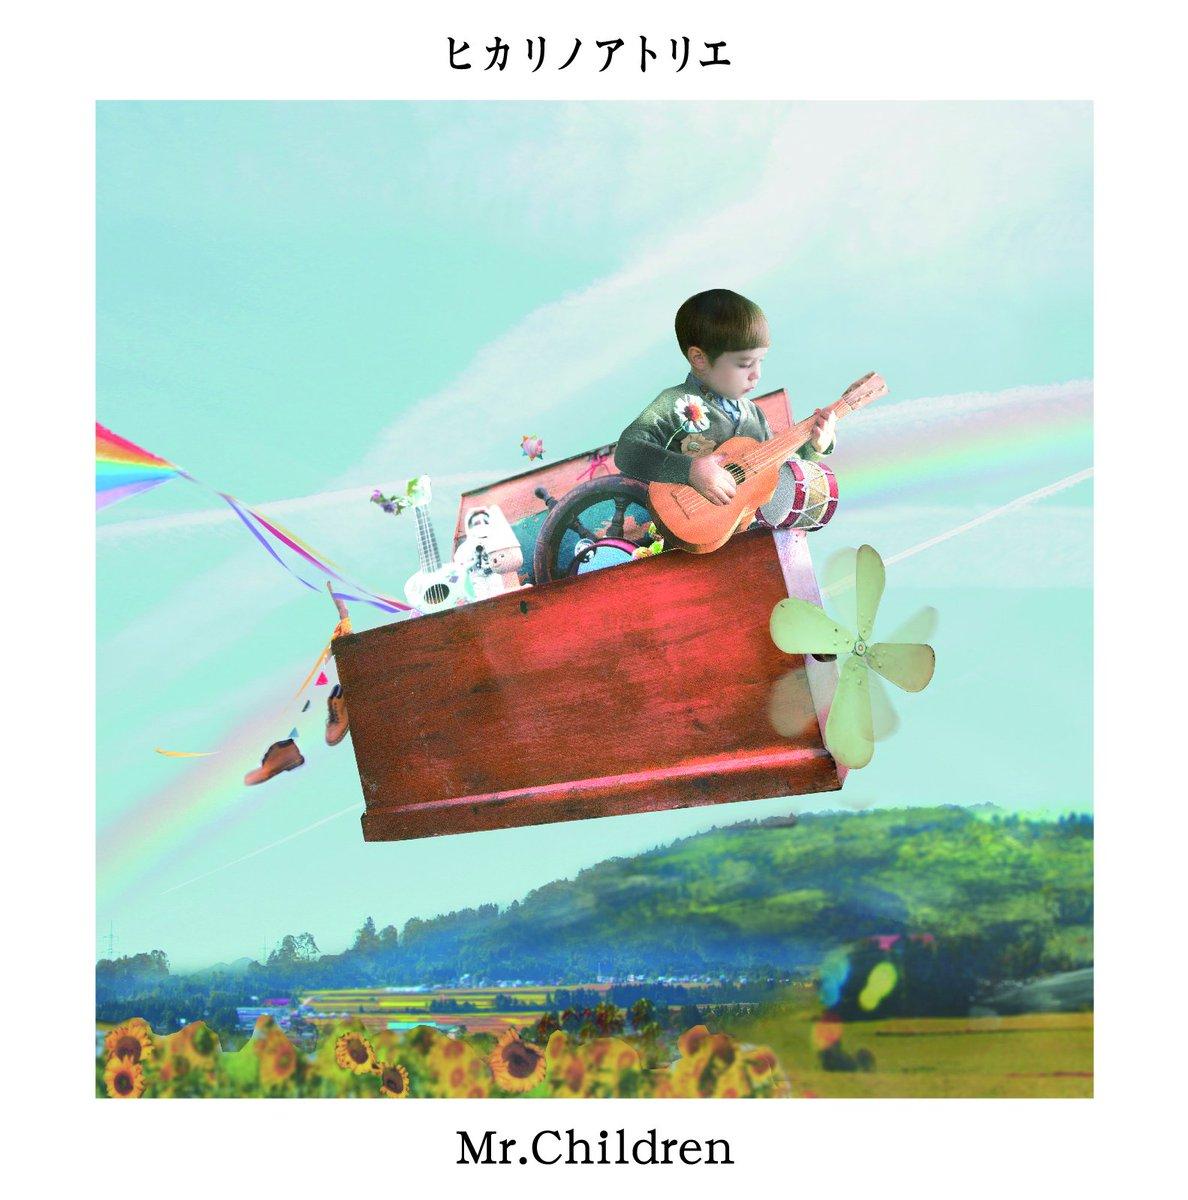 【Mr.Children】NHK連続テレビ小説『べっぴんさん』主題歌「ヒカリノアトリエ」 New Single 2017.1.11 リリース決定!&2017年春ツアー開催決定! https://t.co/lrlLdRQy2K